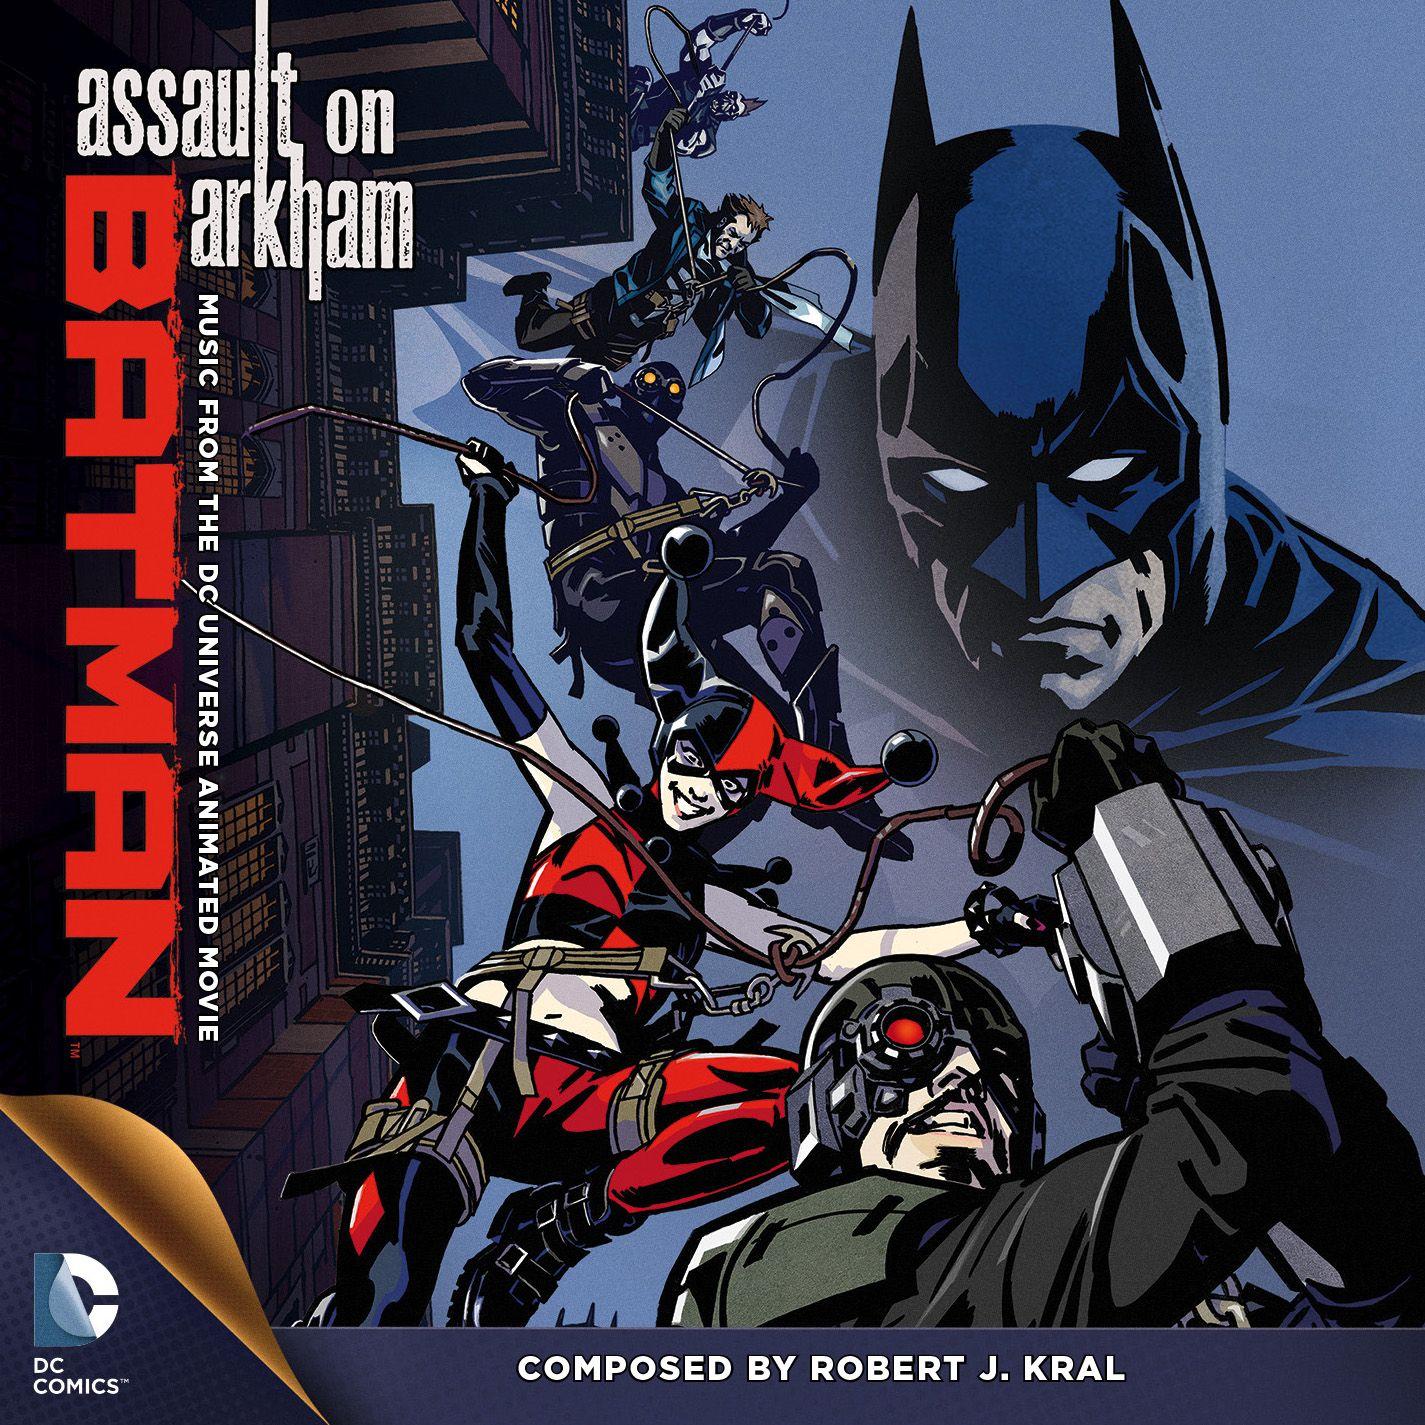 Soundtrack To Batman Assault On Arkham By Robert J Kral Superman Doomsday Duck Dodgesrs Debuts 8 26 Http Ow Ly Ack3a Batman Batman Arkham Dc Universe